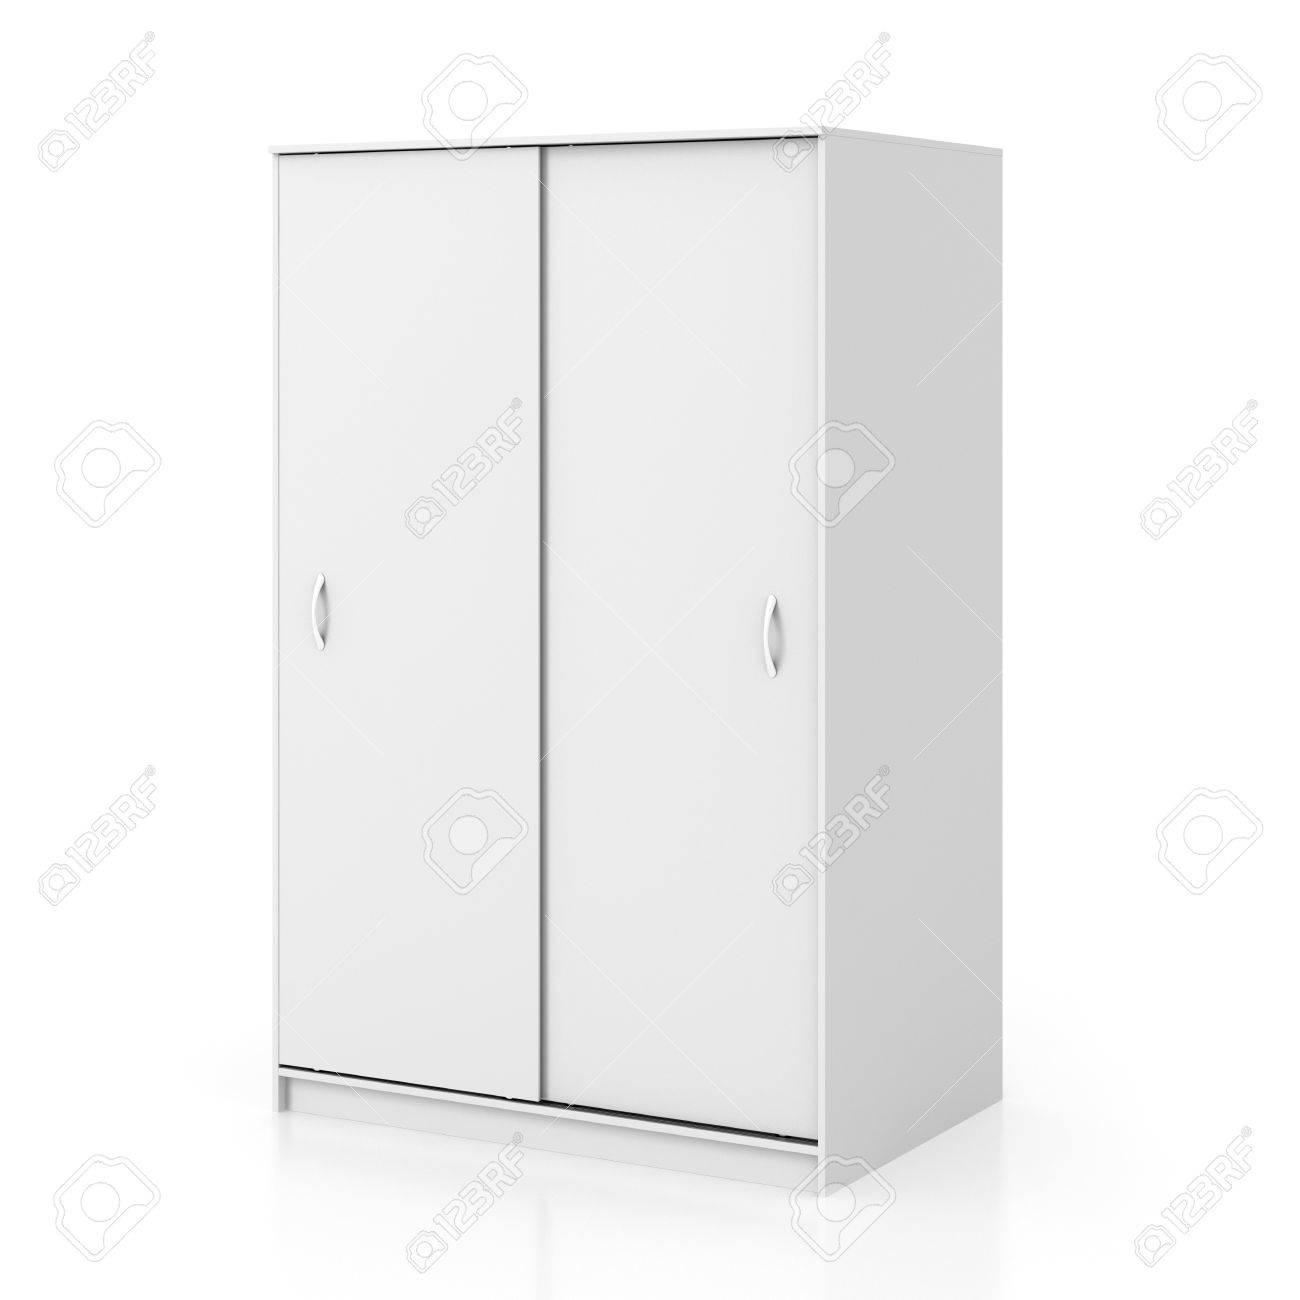 White Wardrobe With Closed Sliding Door Isolated On White 1300x1300